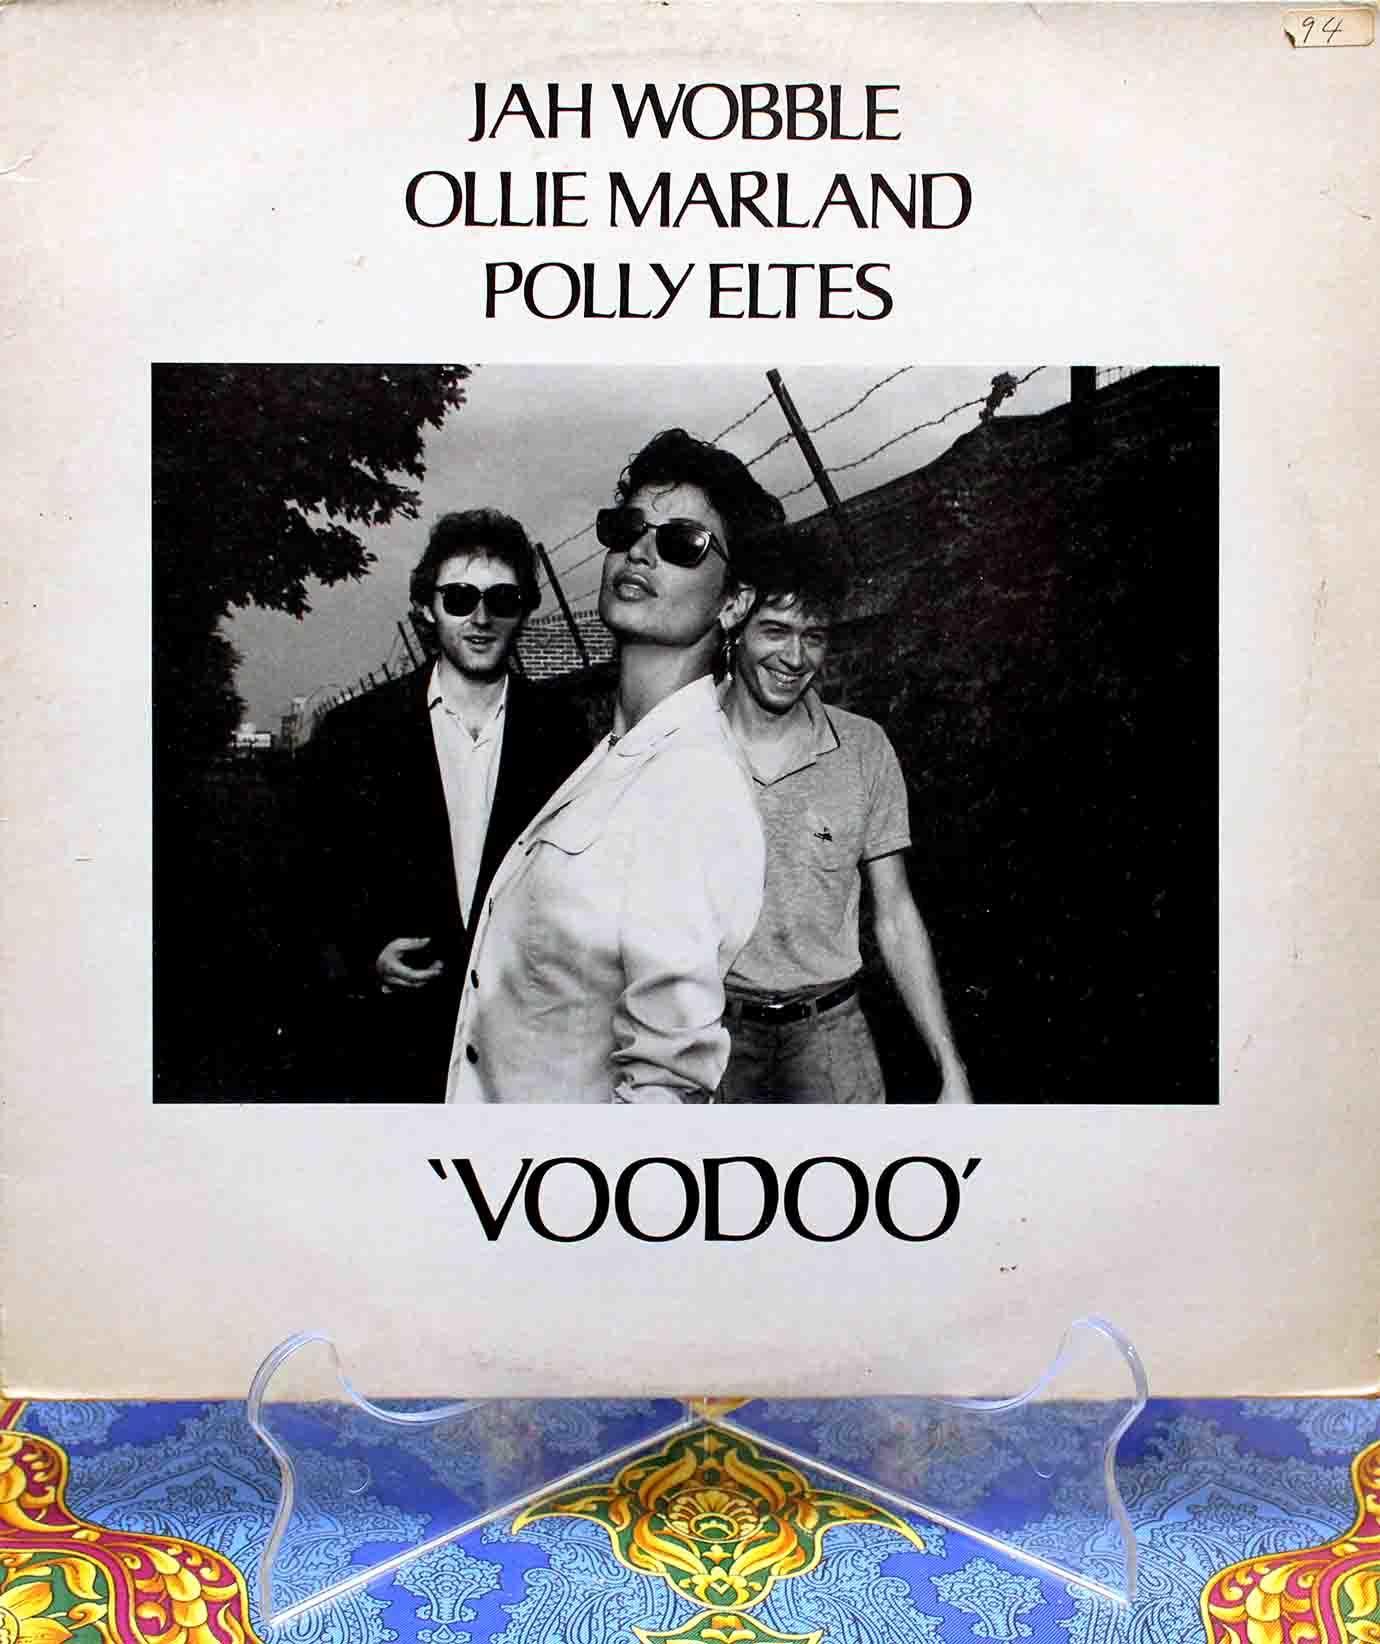 Jah Wobble, Ollie Marland, Polly Eltes  Voodoo 01